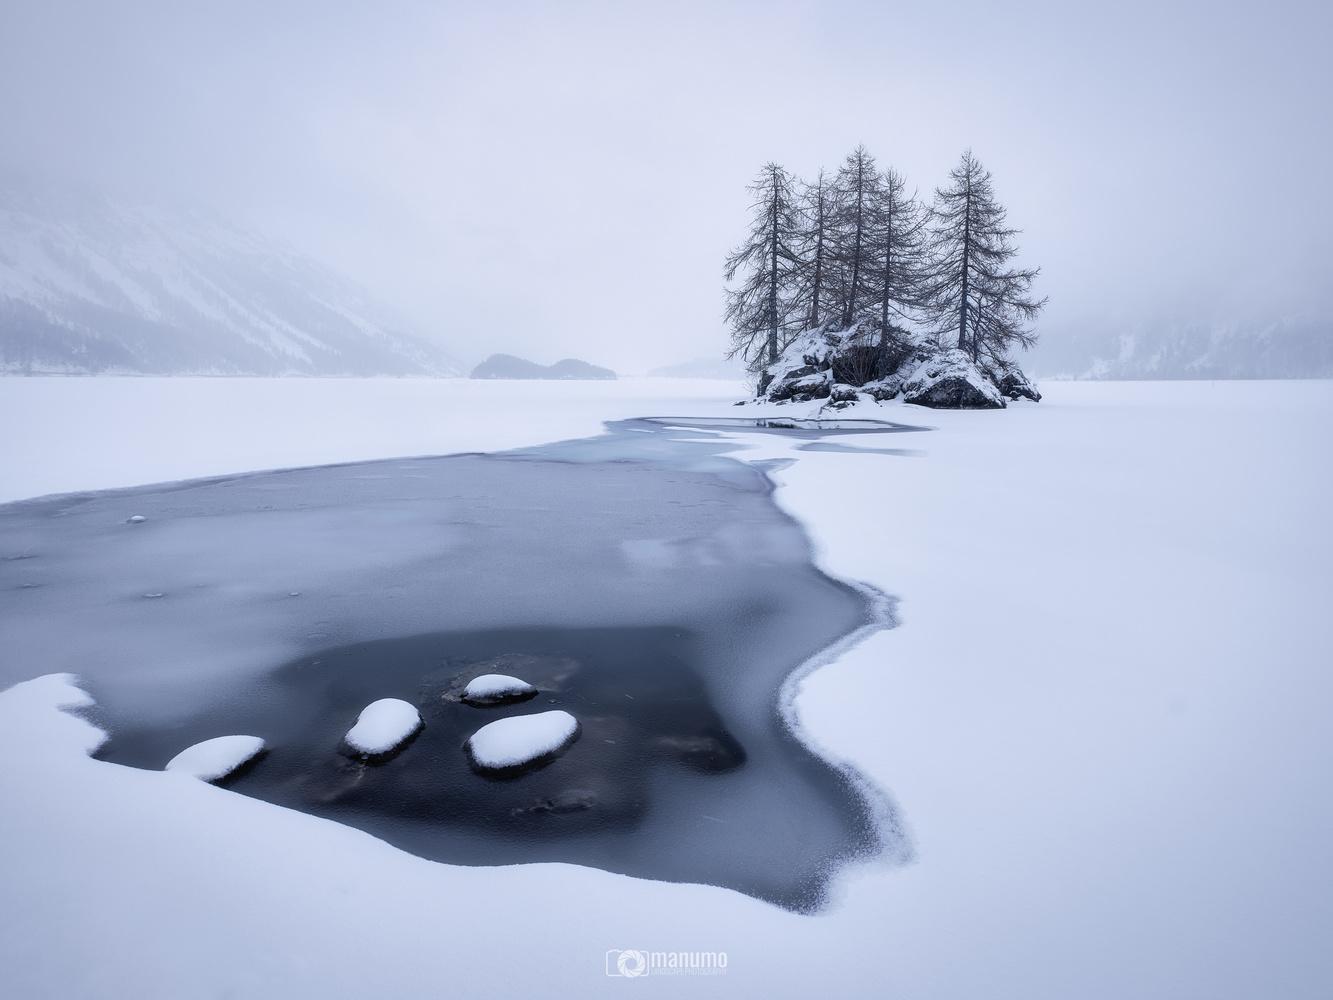 TREE ISLAND by Manuel Mohorovic